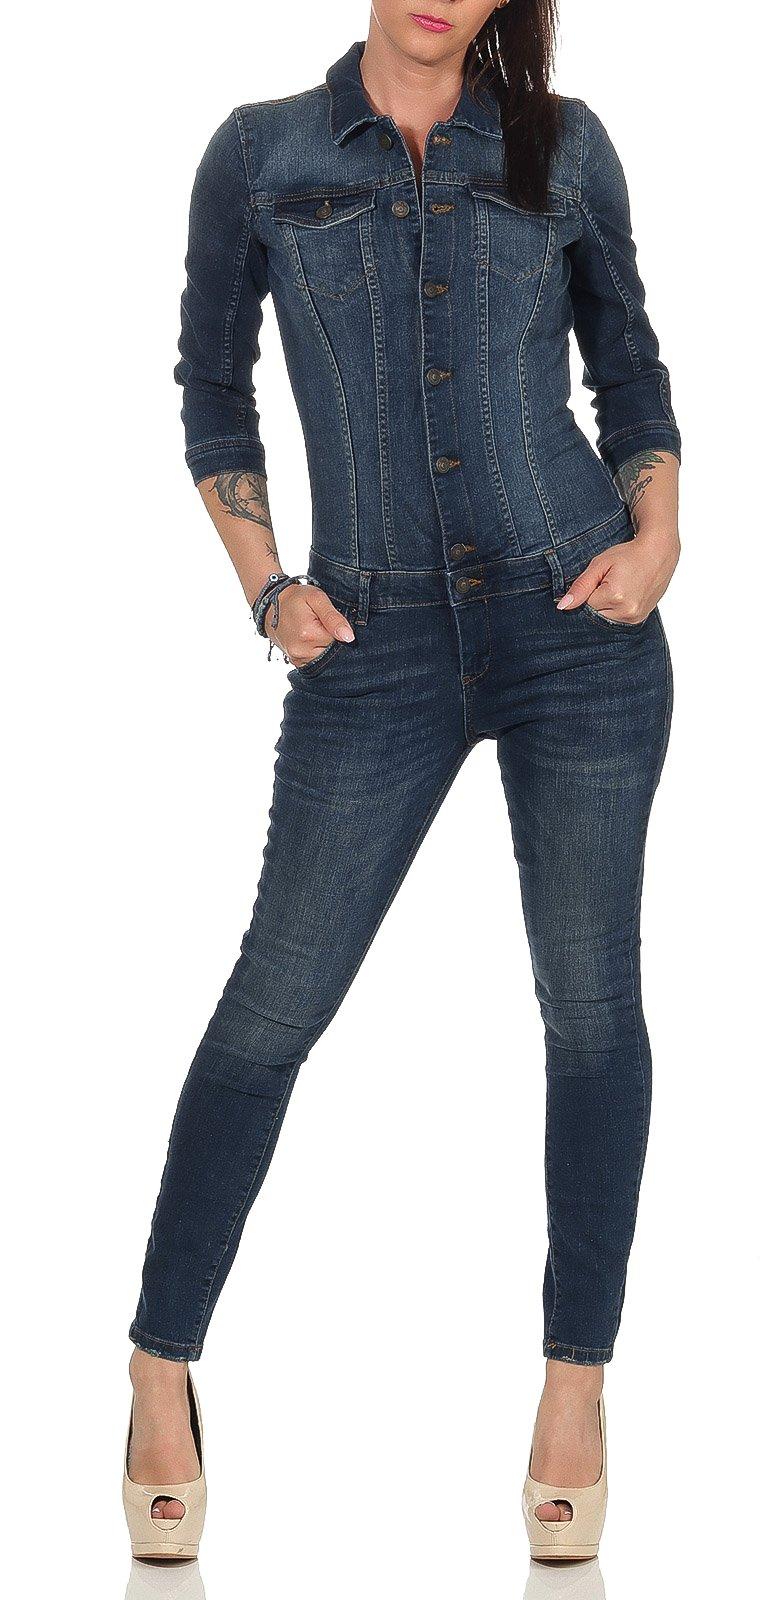 save off 6c467 24806 Only Damen Jeans Jumpsuit Julia dark blue denim